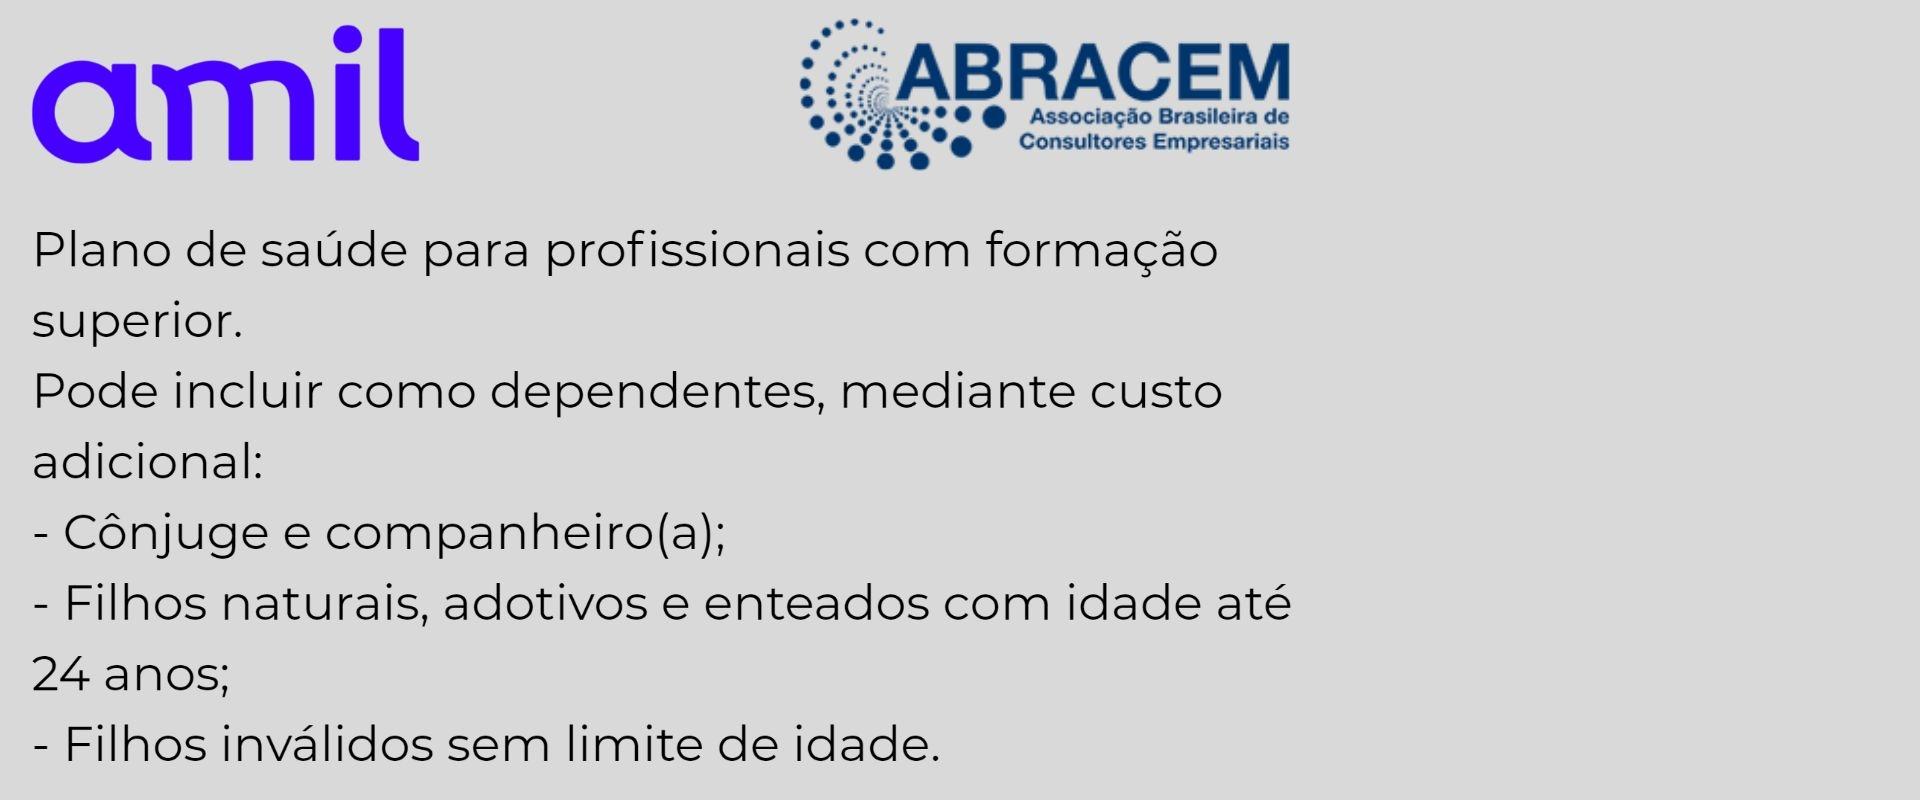 Amil Abracem-CE